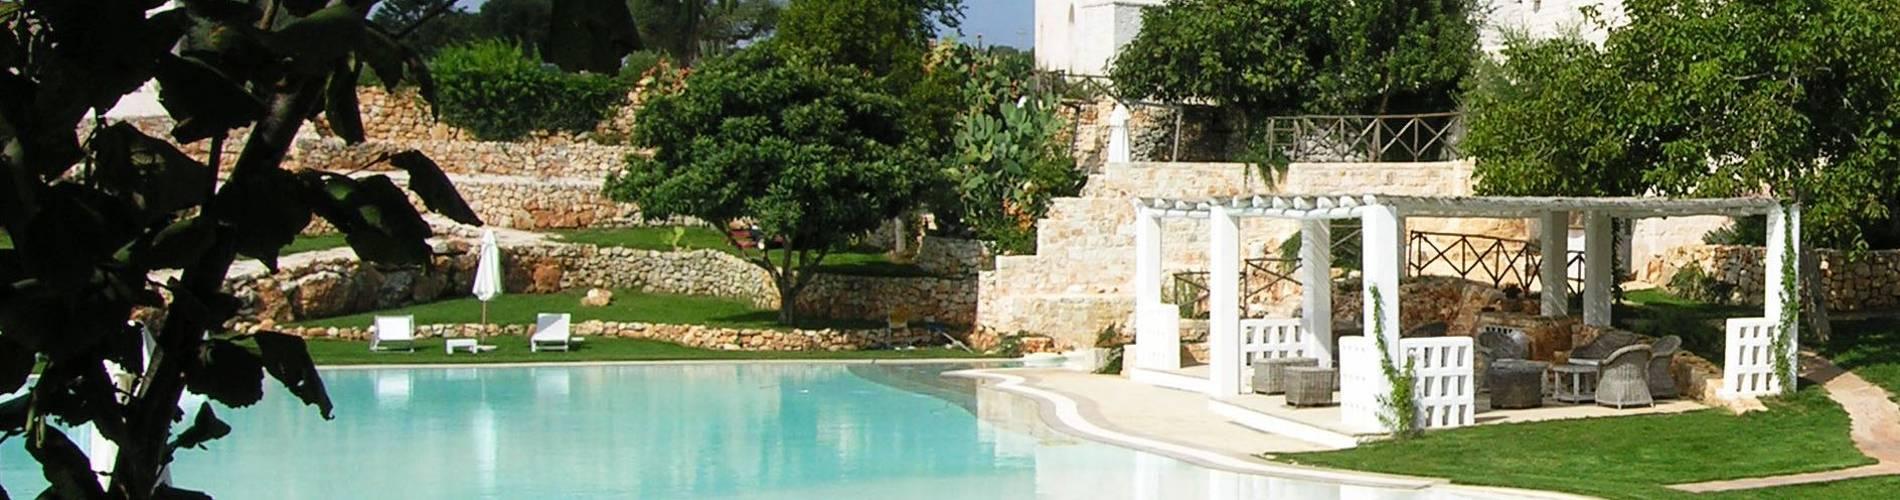 Masseria Cervarolo, Puglia, Italy (56).jpg